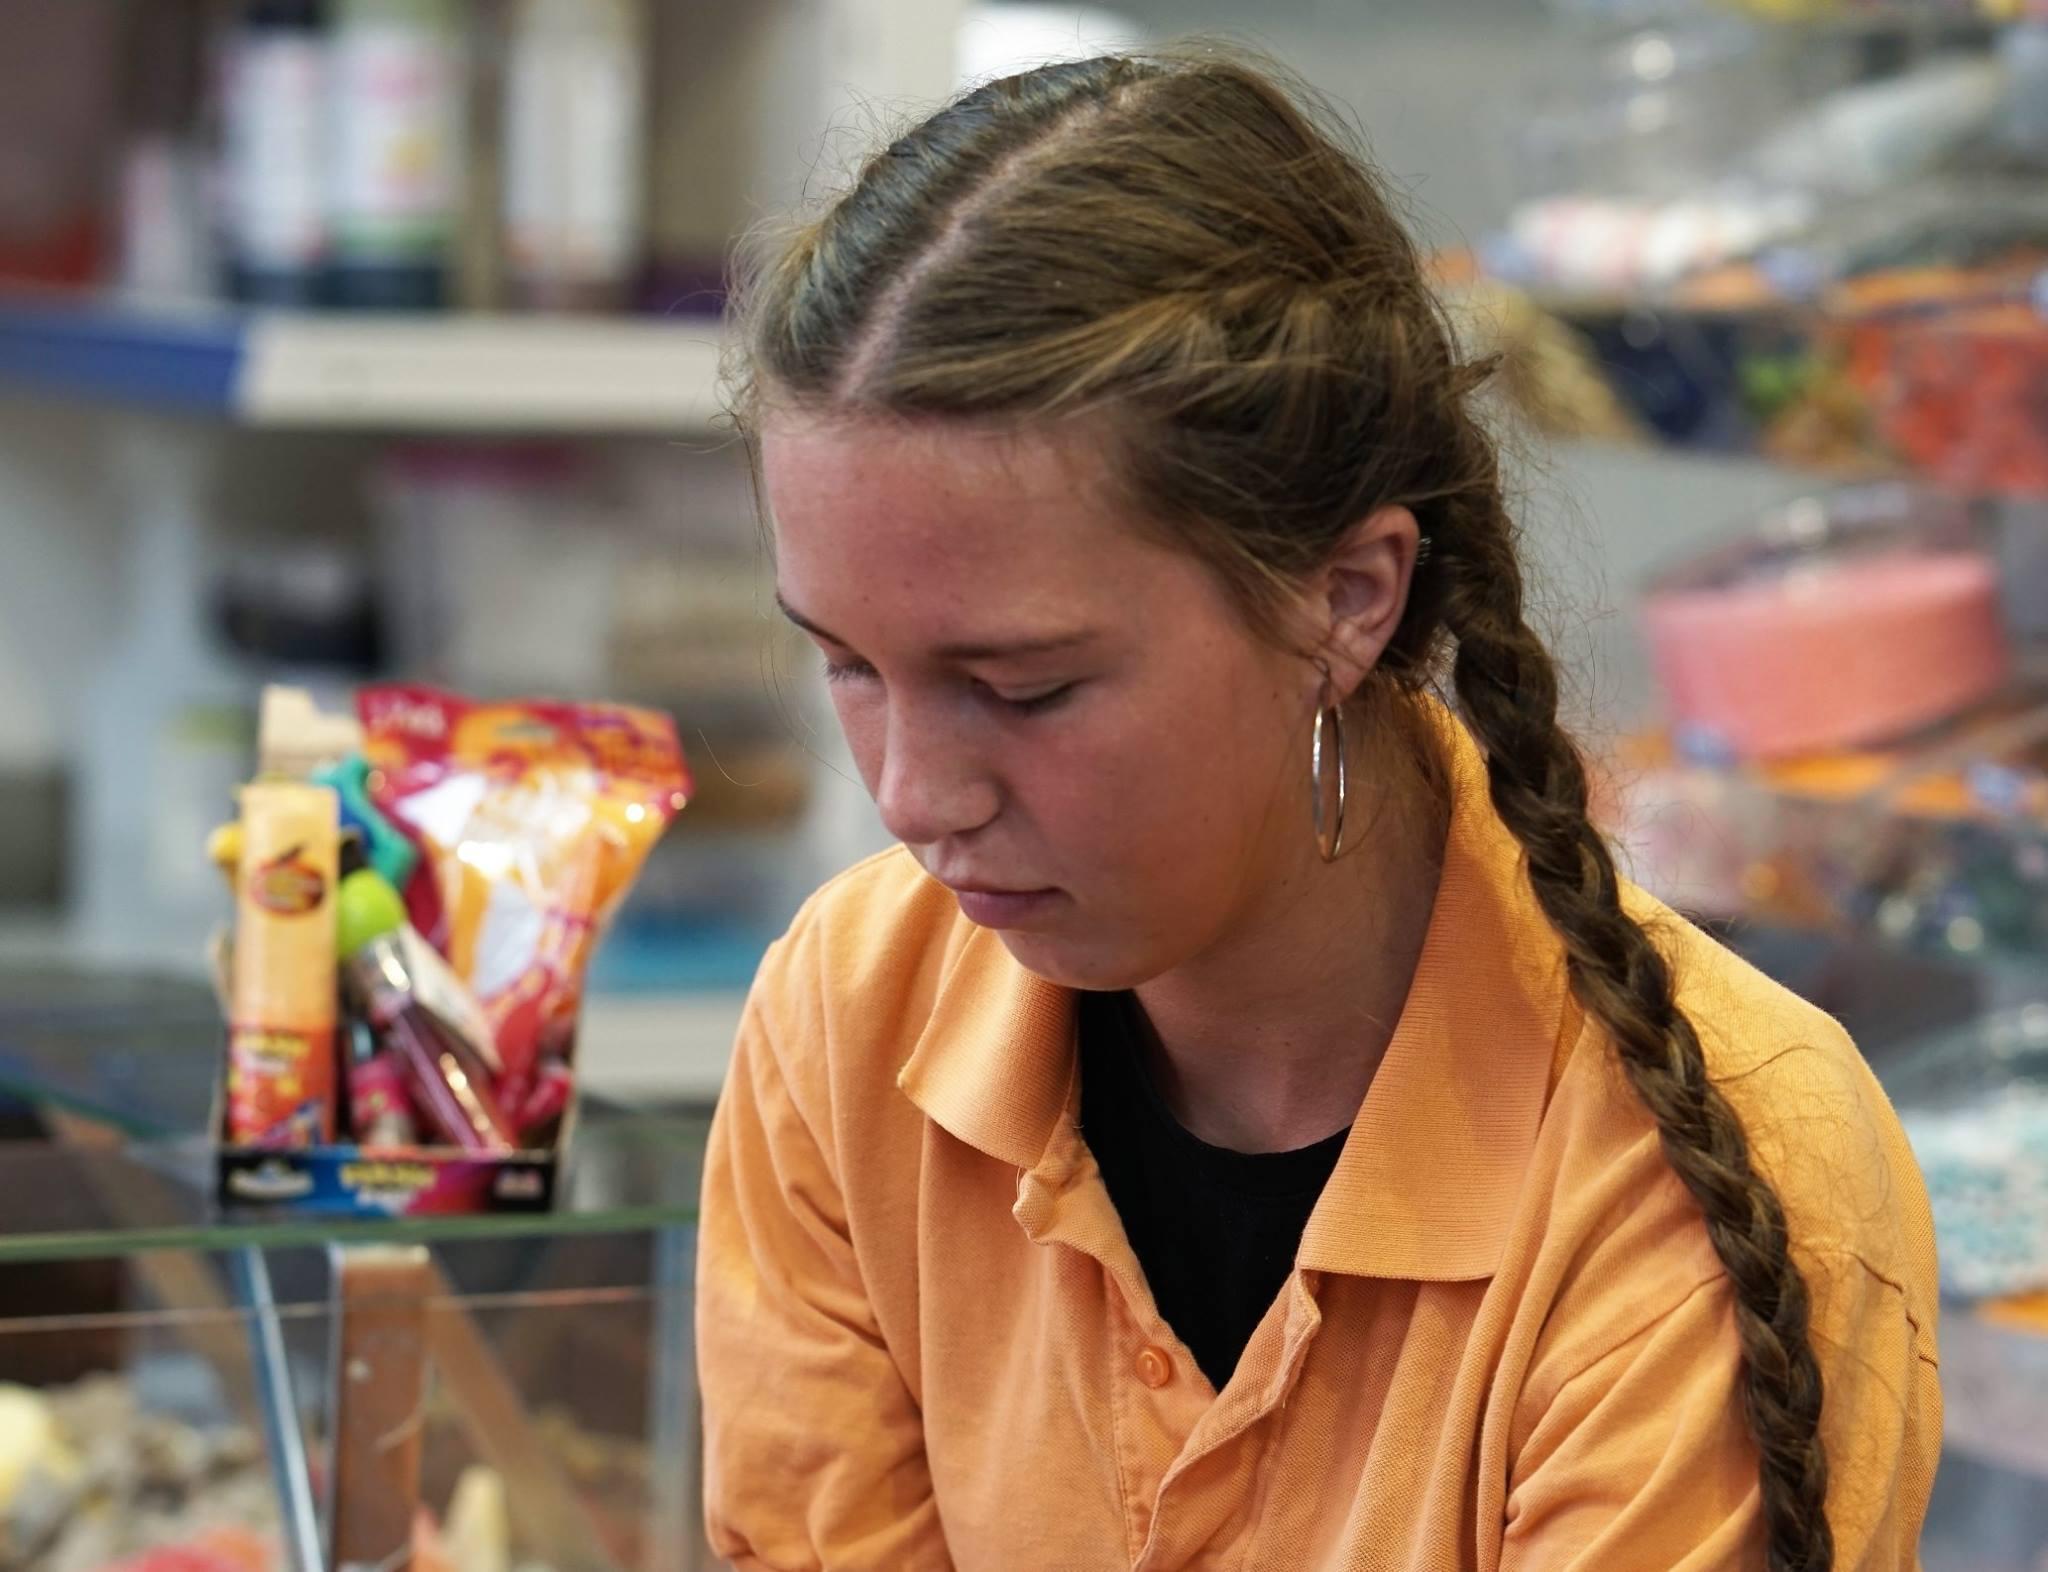 Candy Shop 6